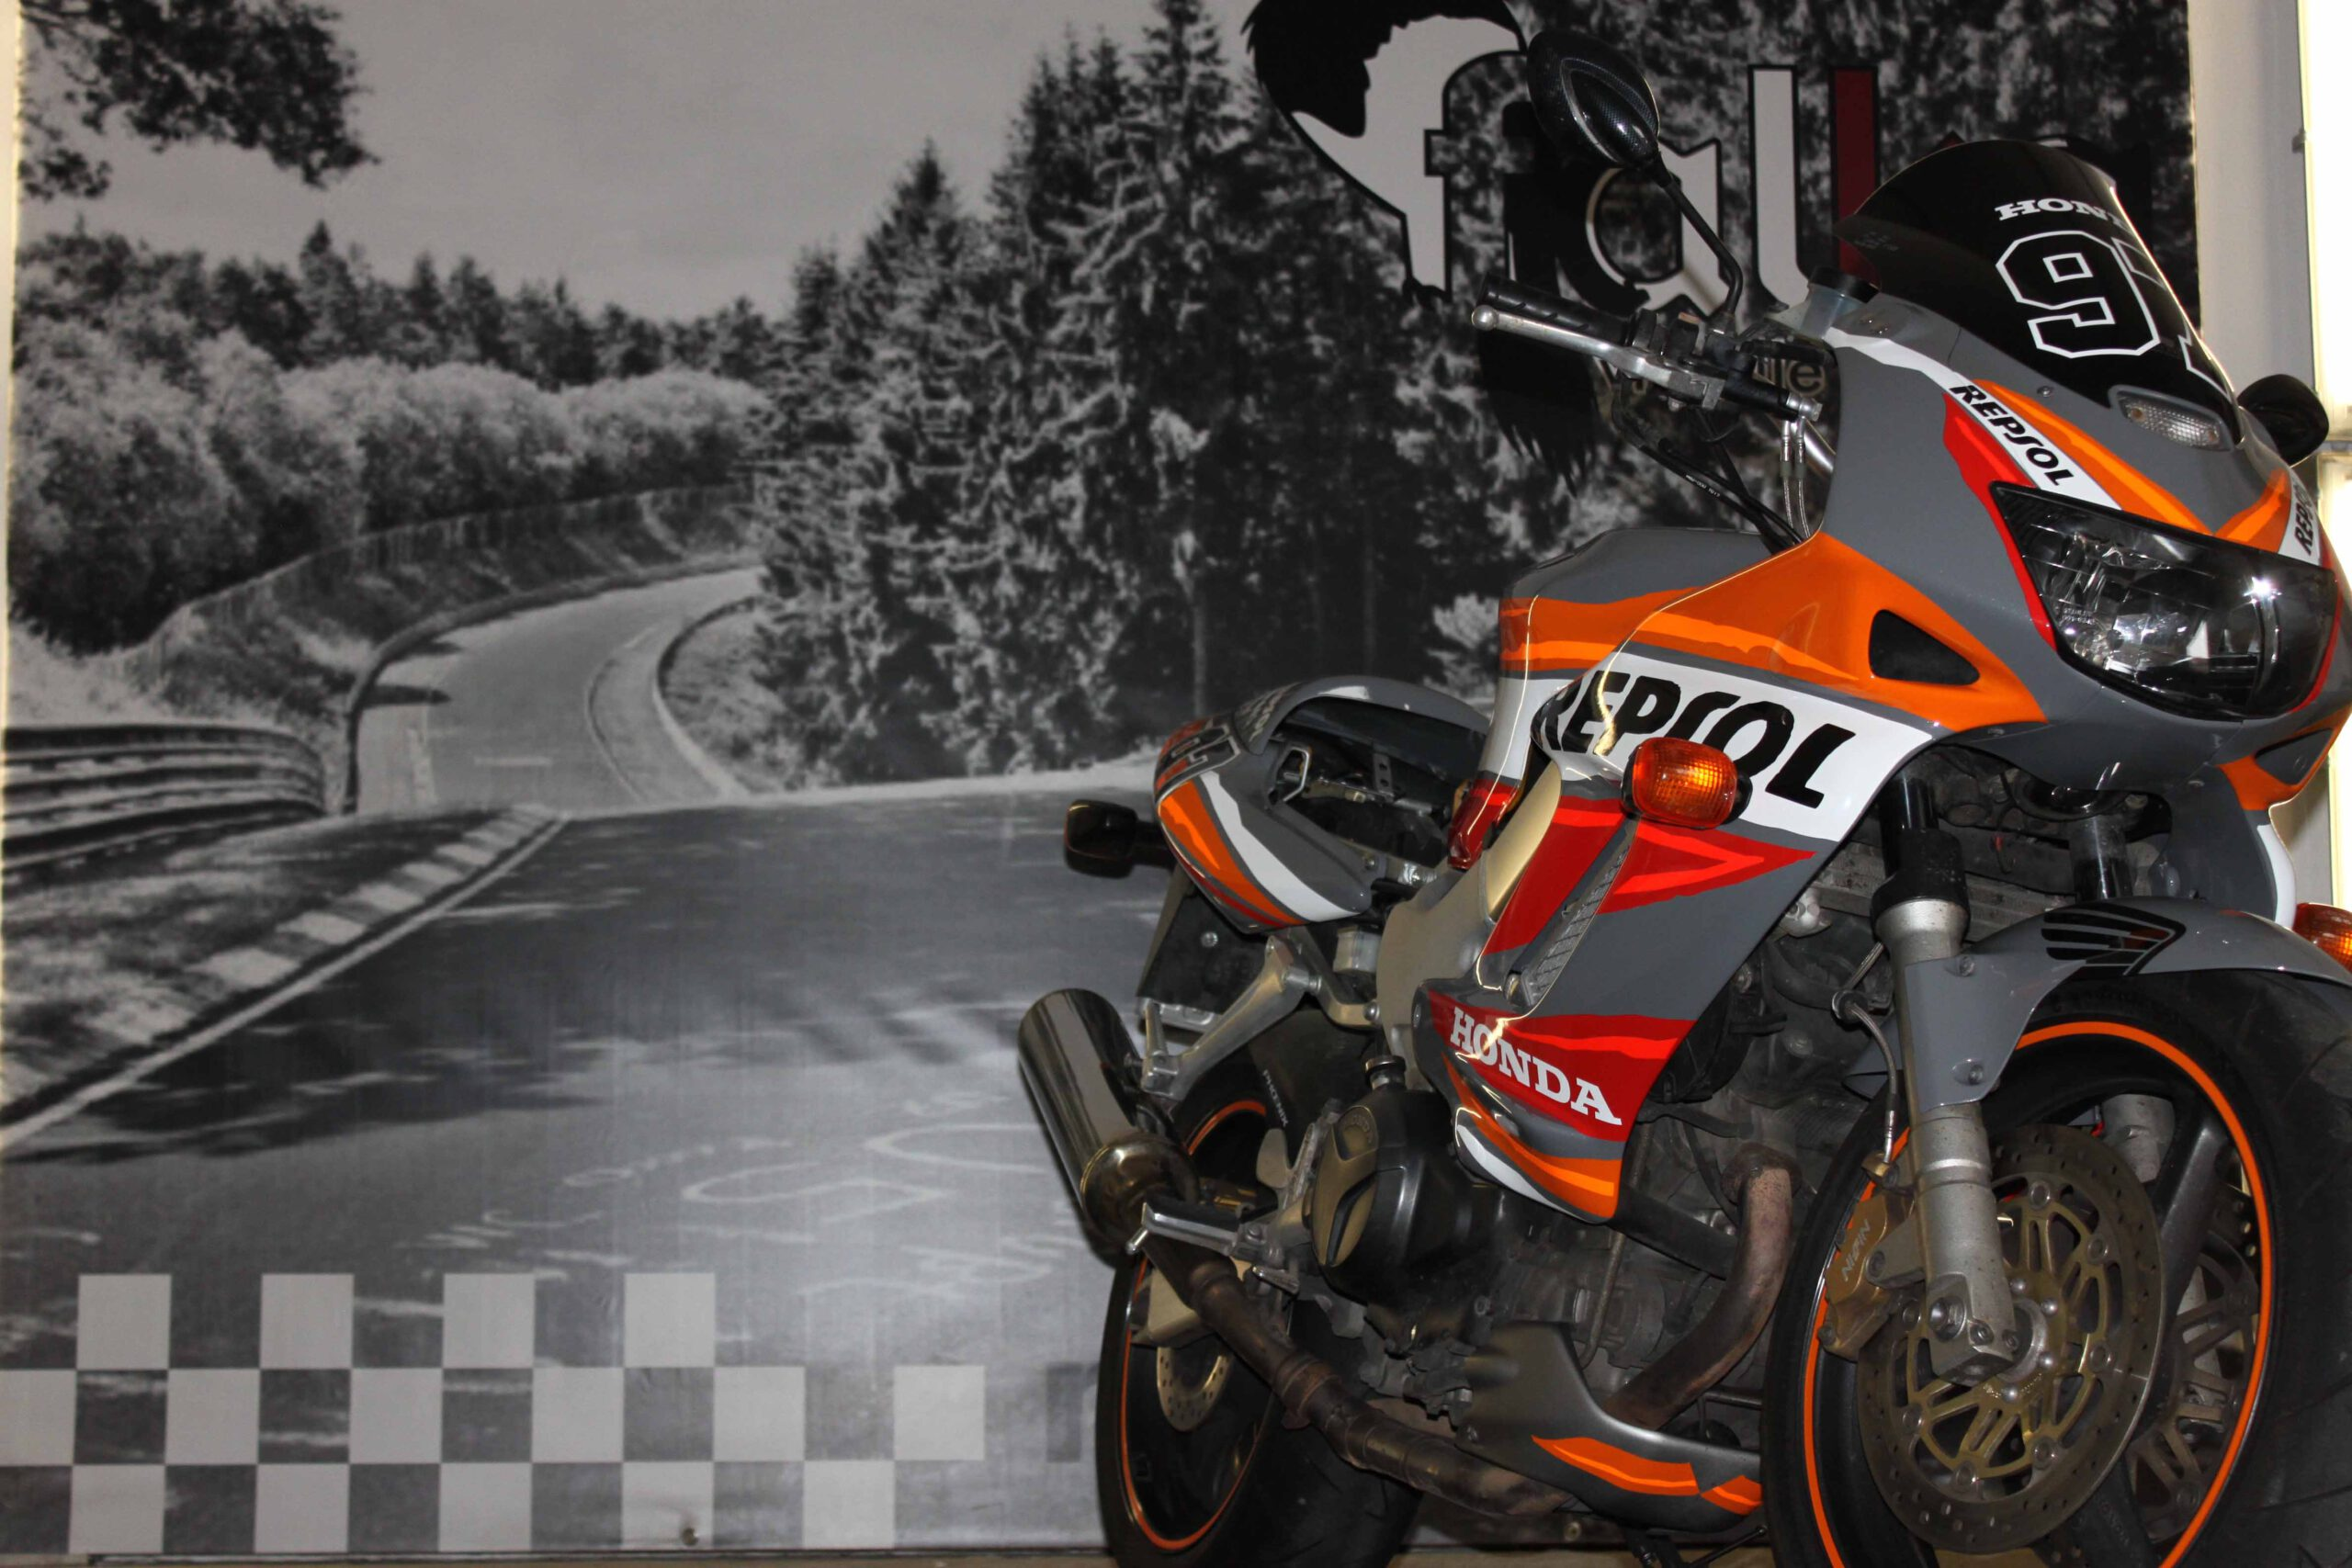 Motorrad_fluoreszierende_Folie